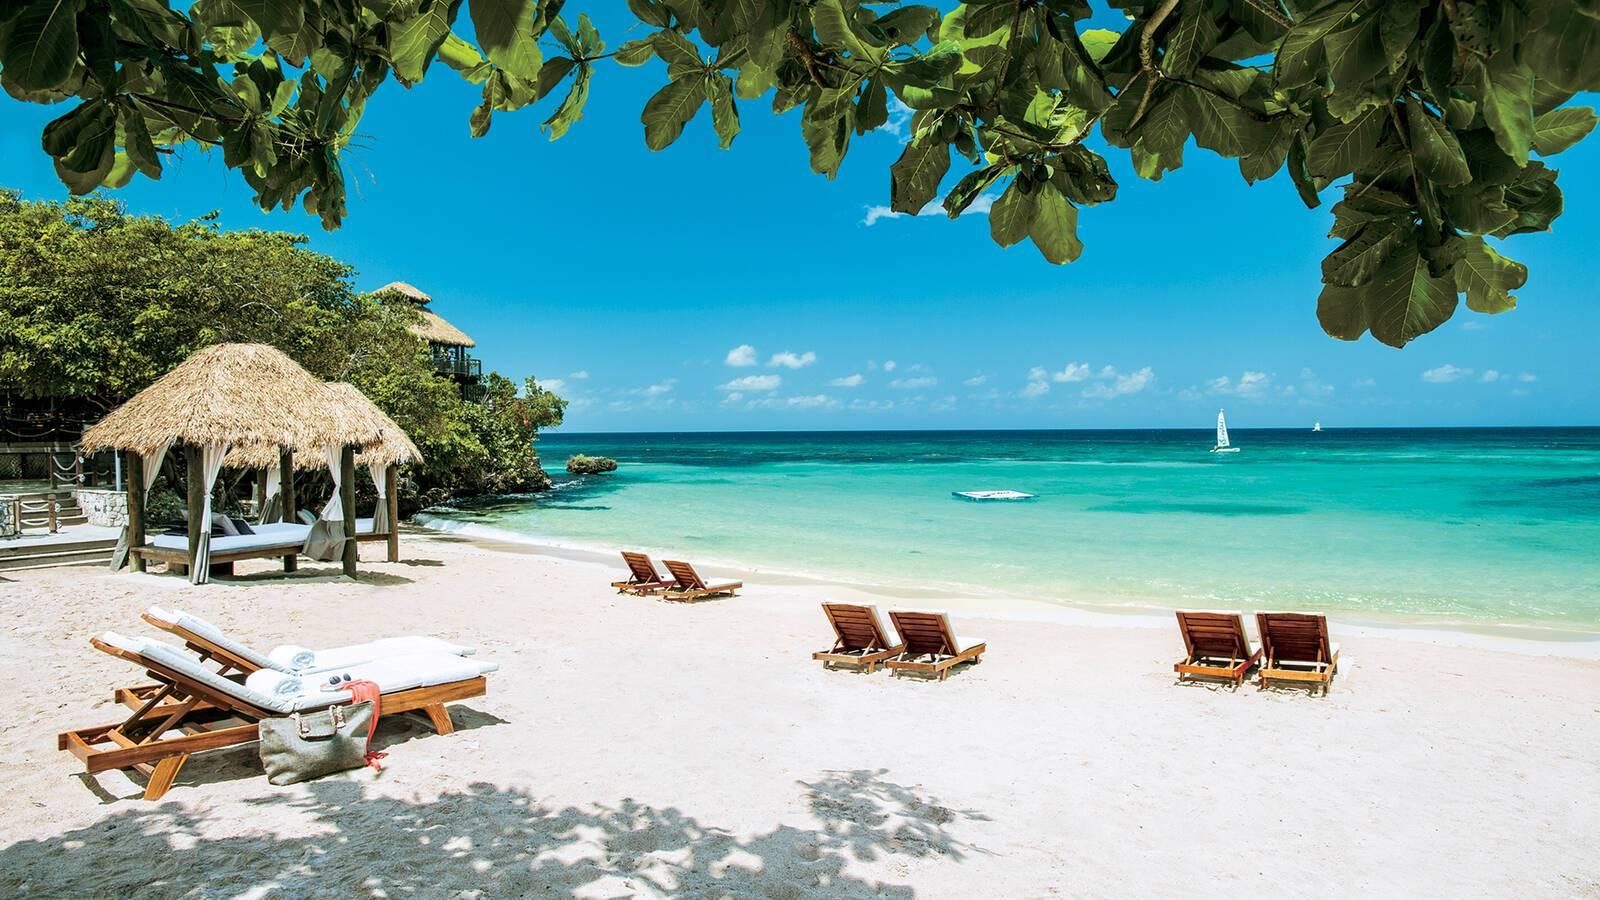 Sandals Ochi Beach Jamaique Plage